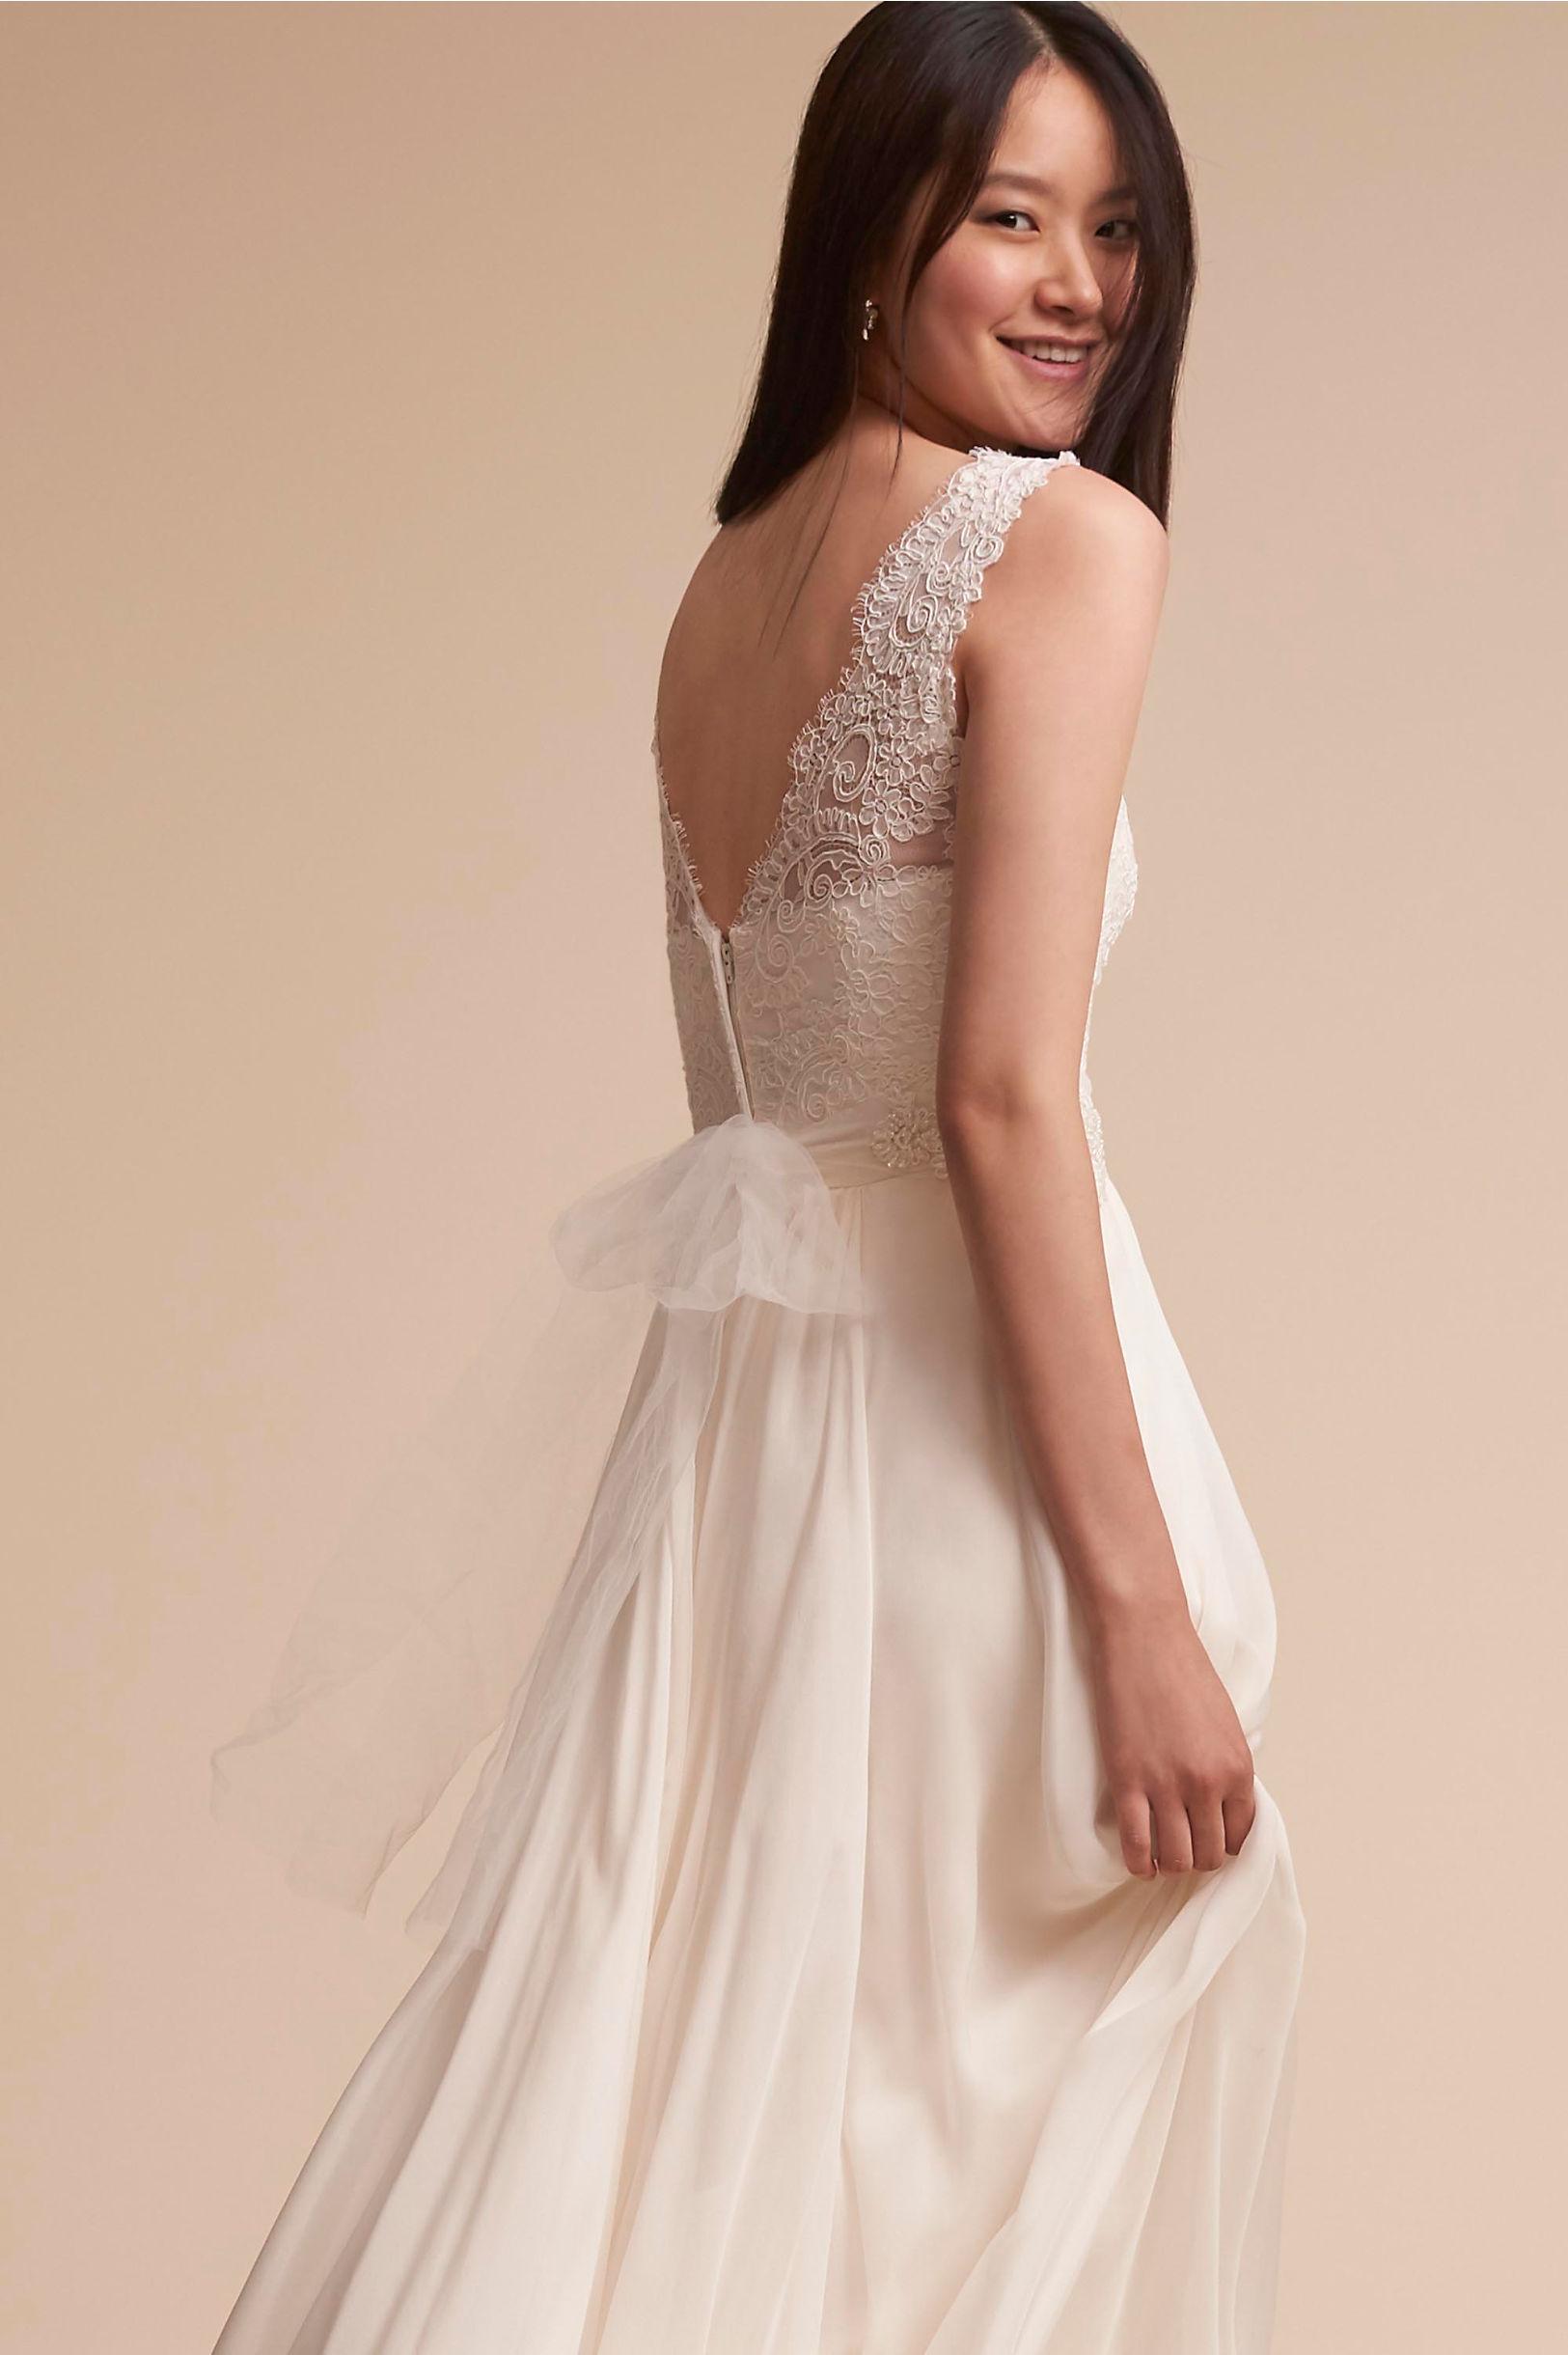 Pirouette Corset Top & Delia Maxi Skirt in Bride | BHLDN